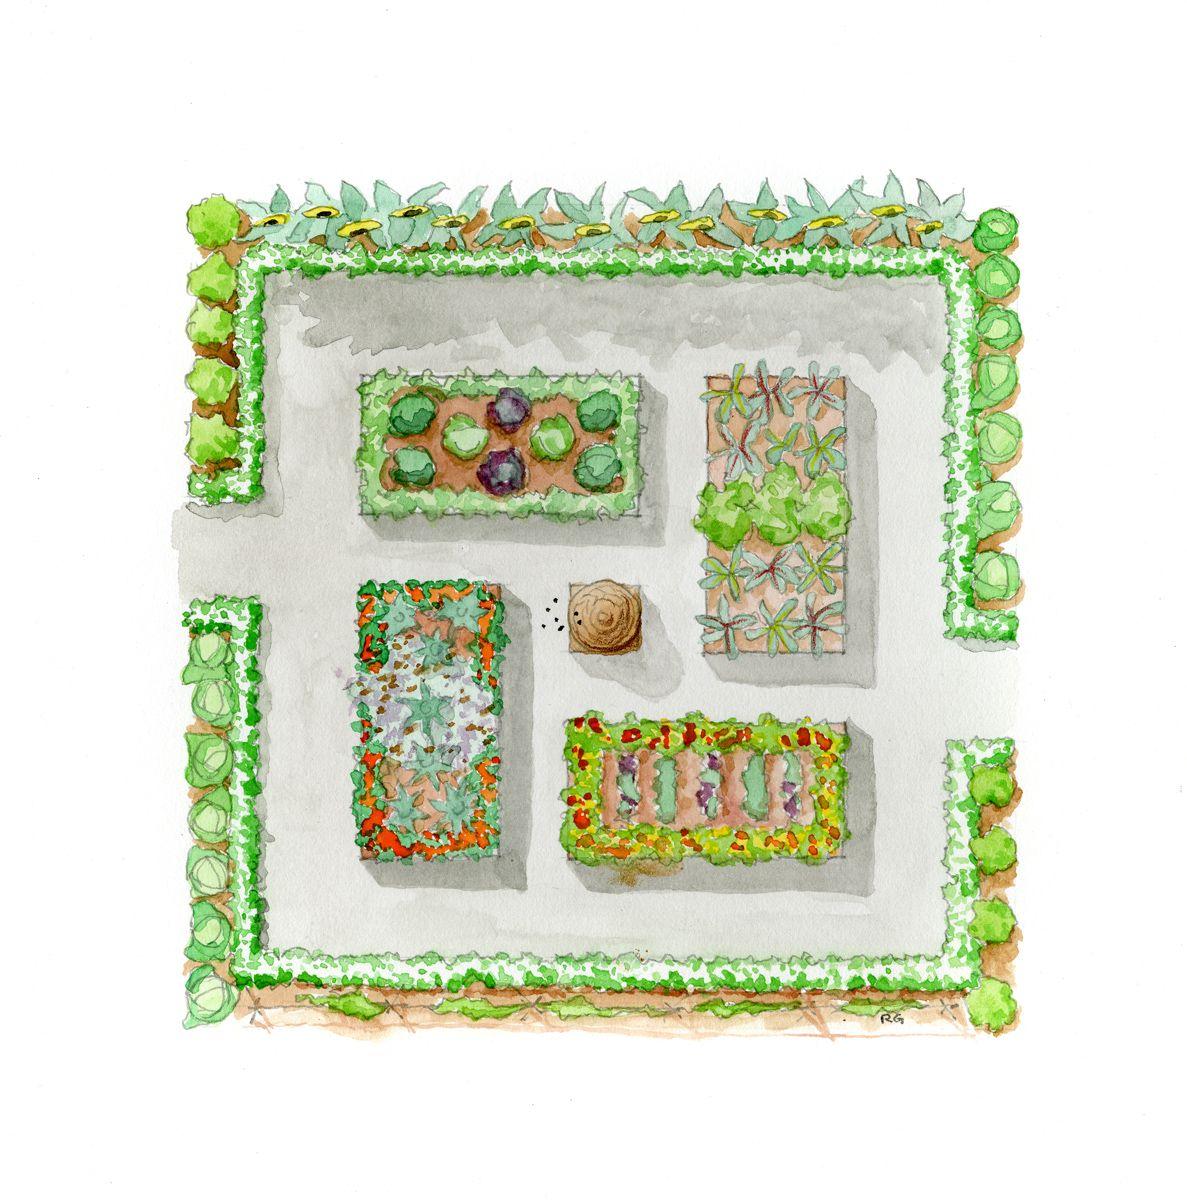 Potager Garden Design Ideas: Raised Garden Beds